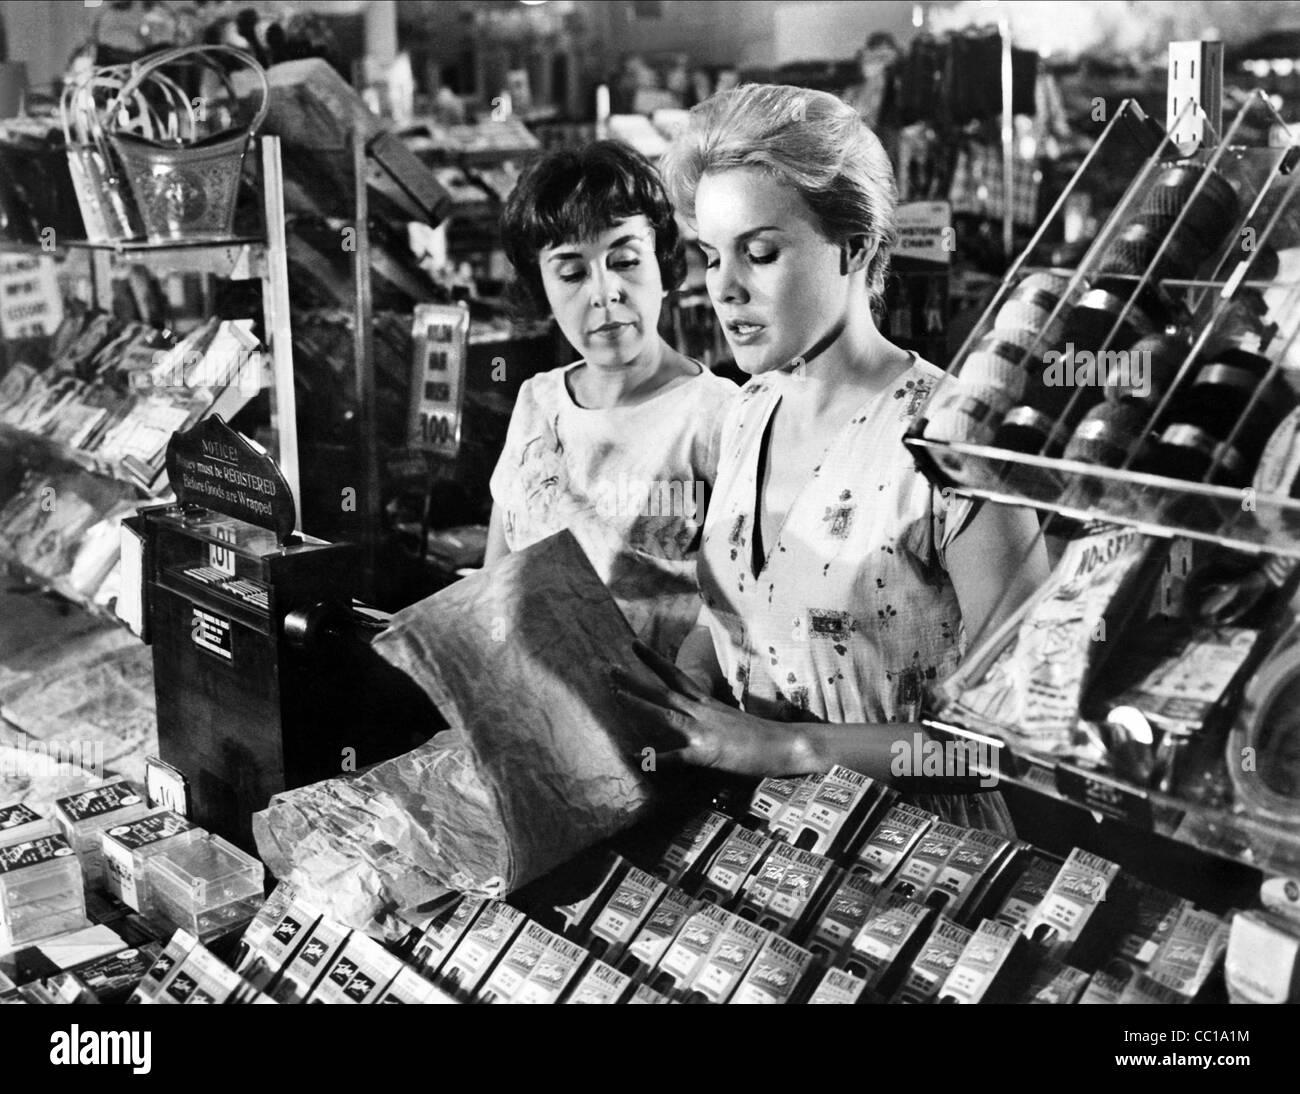 DORIS ROBERTS, CARROLL BAKER, SOMETHING WILD, 1961 - Stock Image